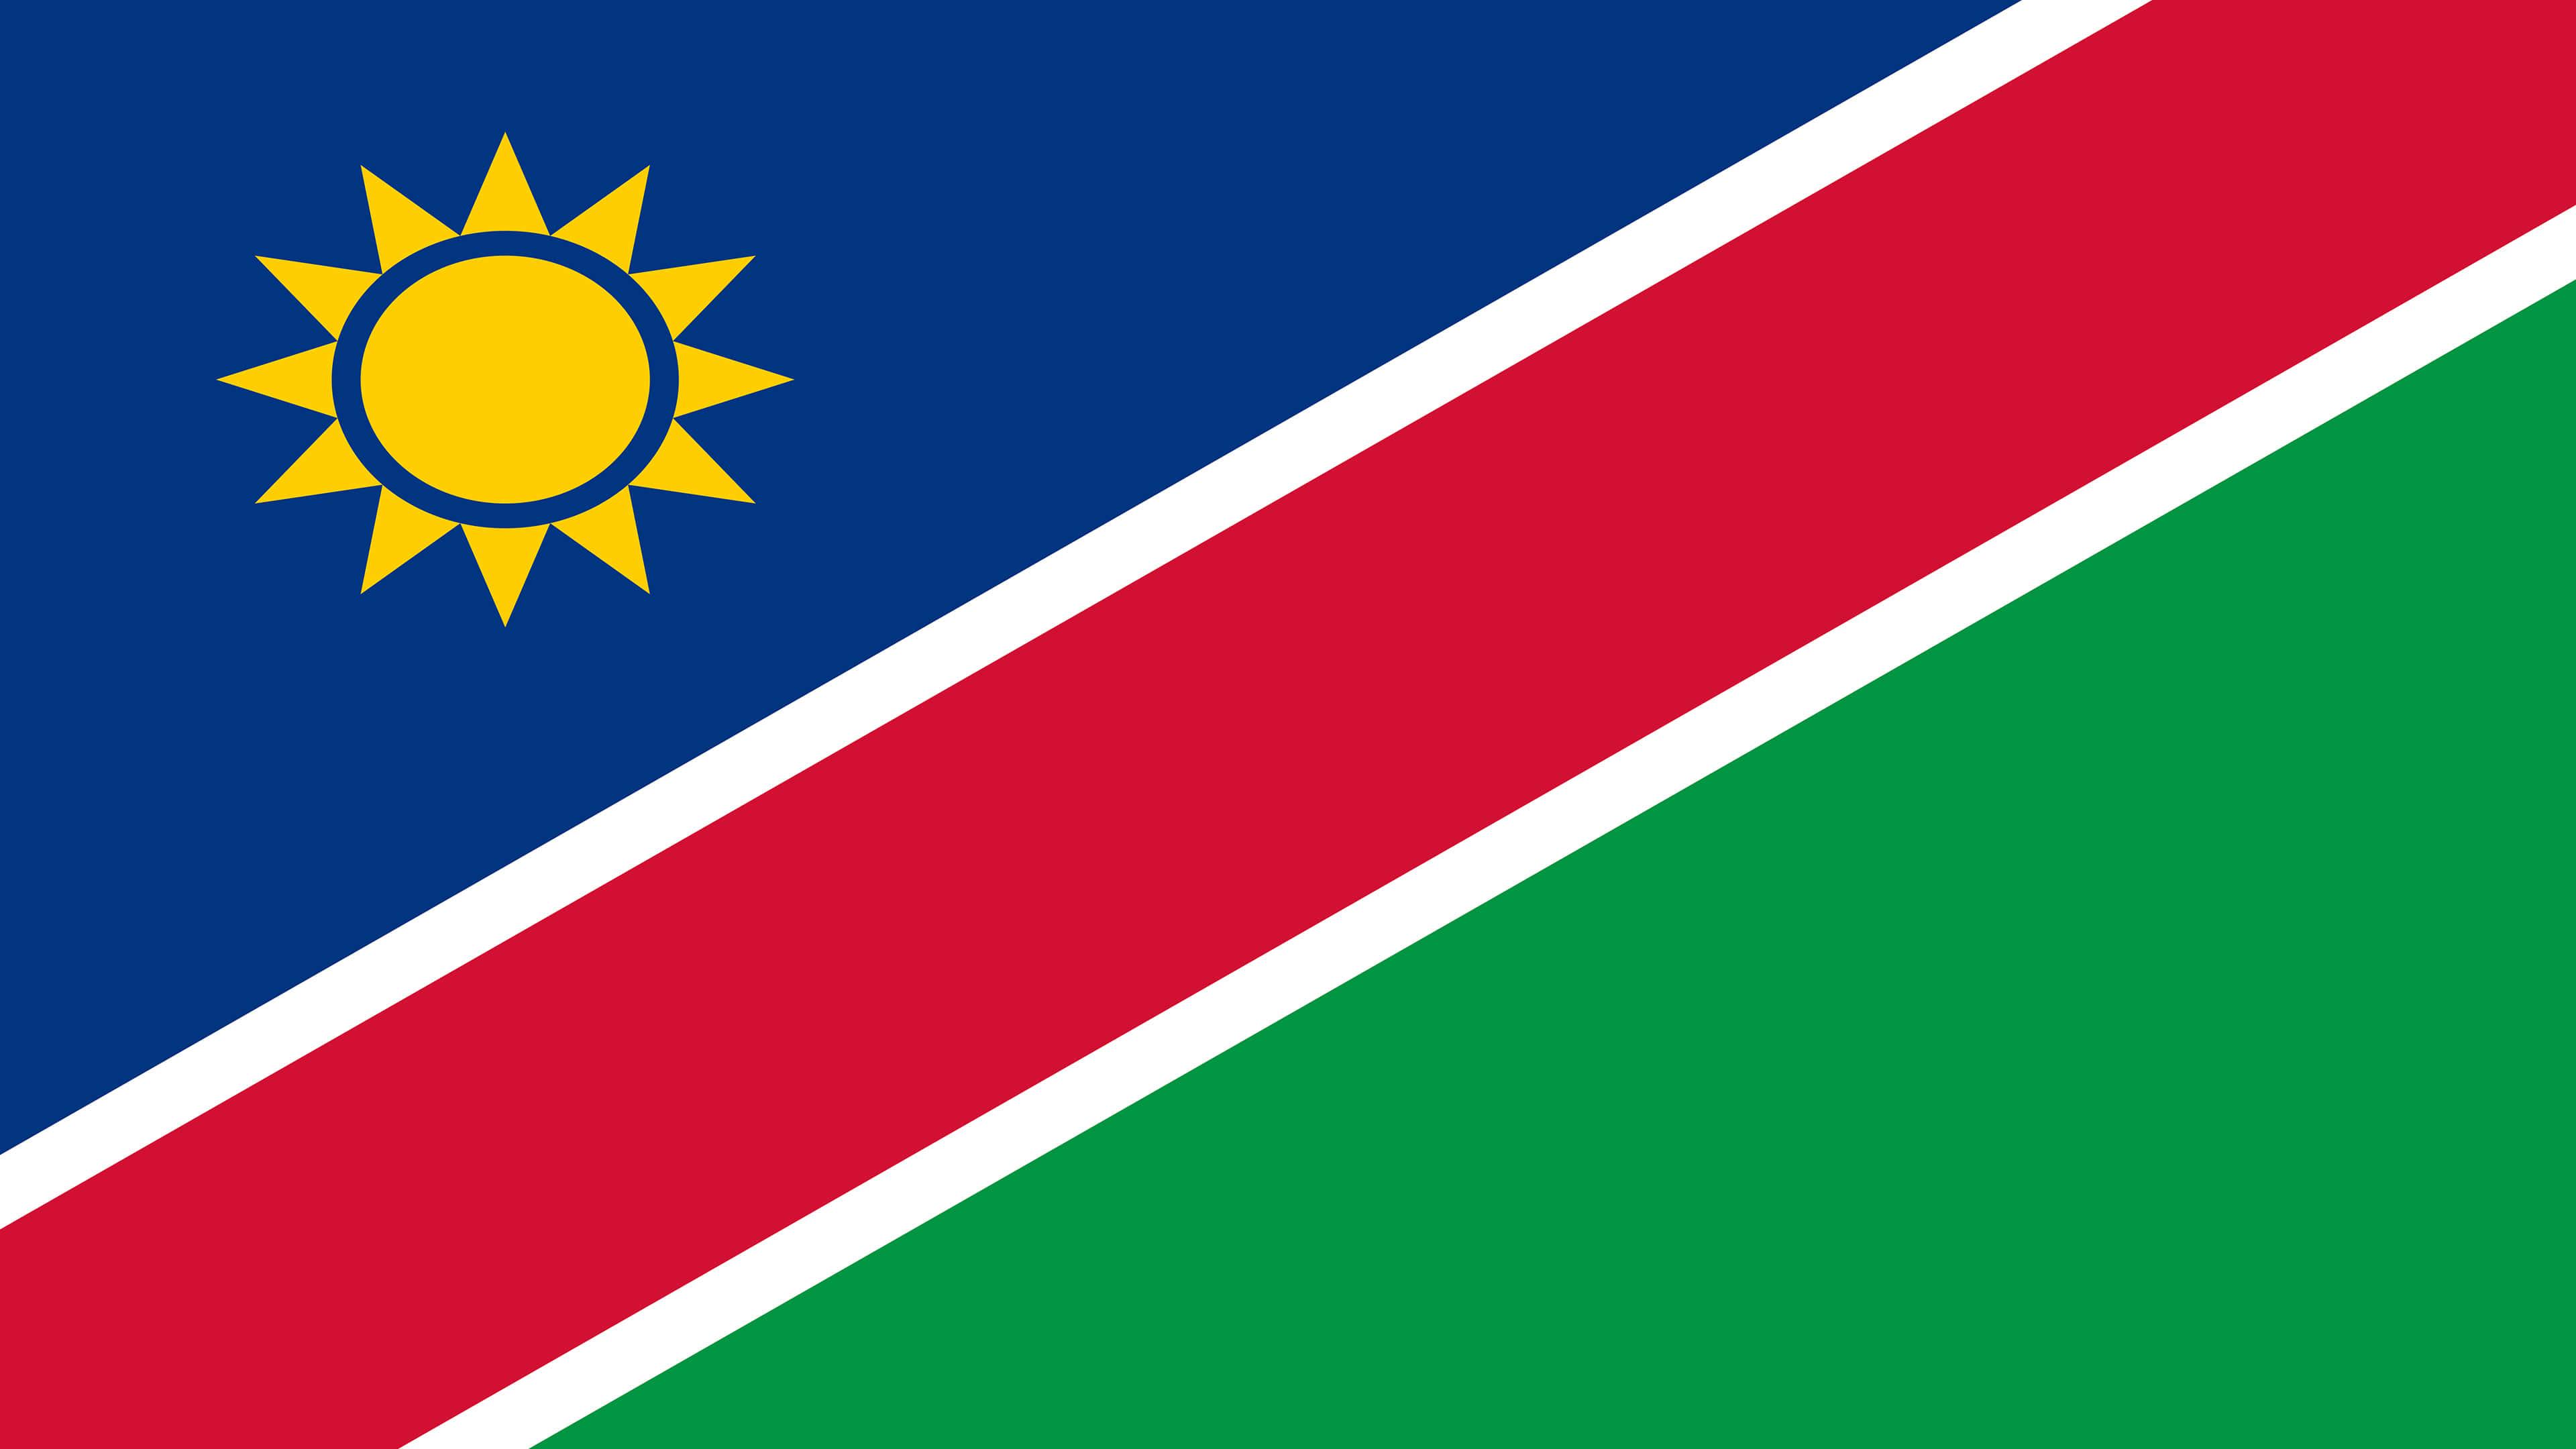 Namibia Flag UHD 4K Wallpaper Pixelz 3840x2160